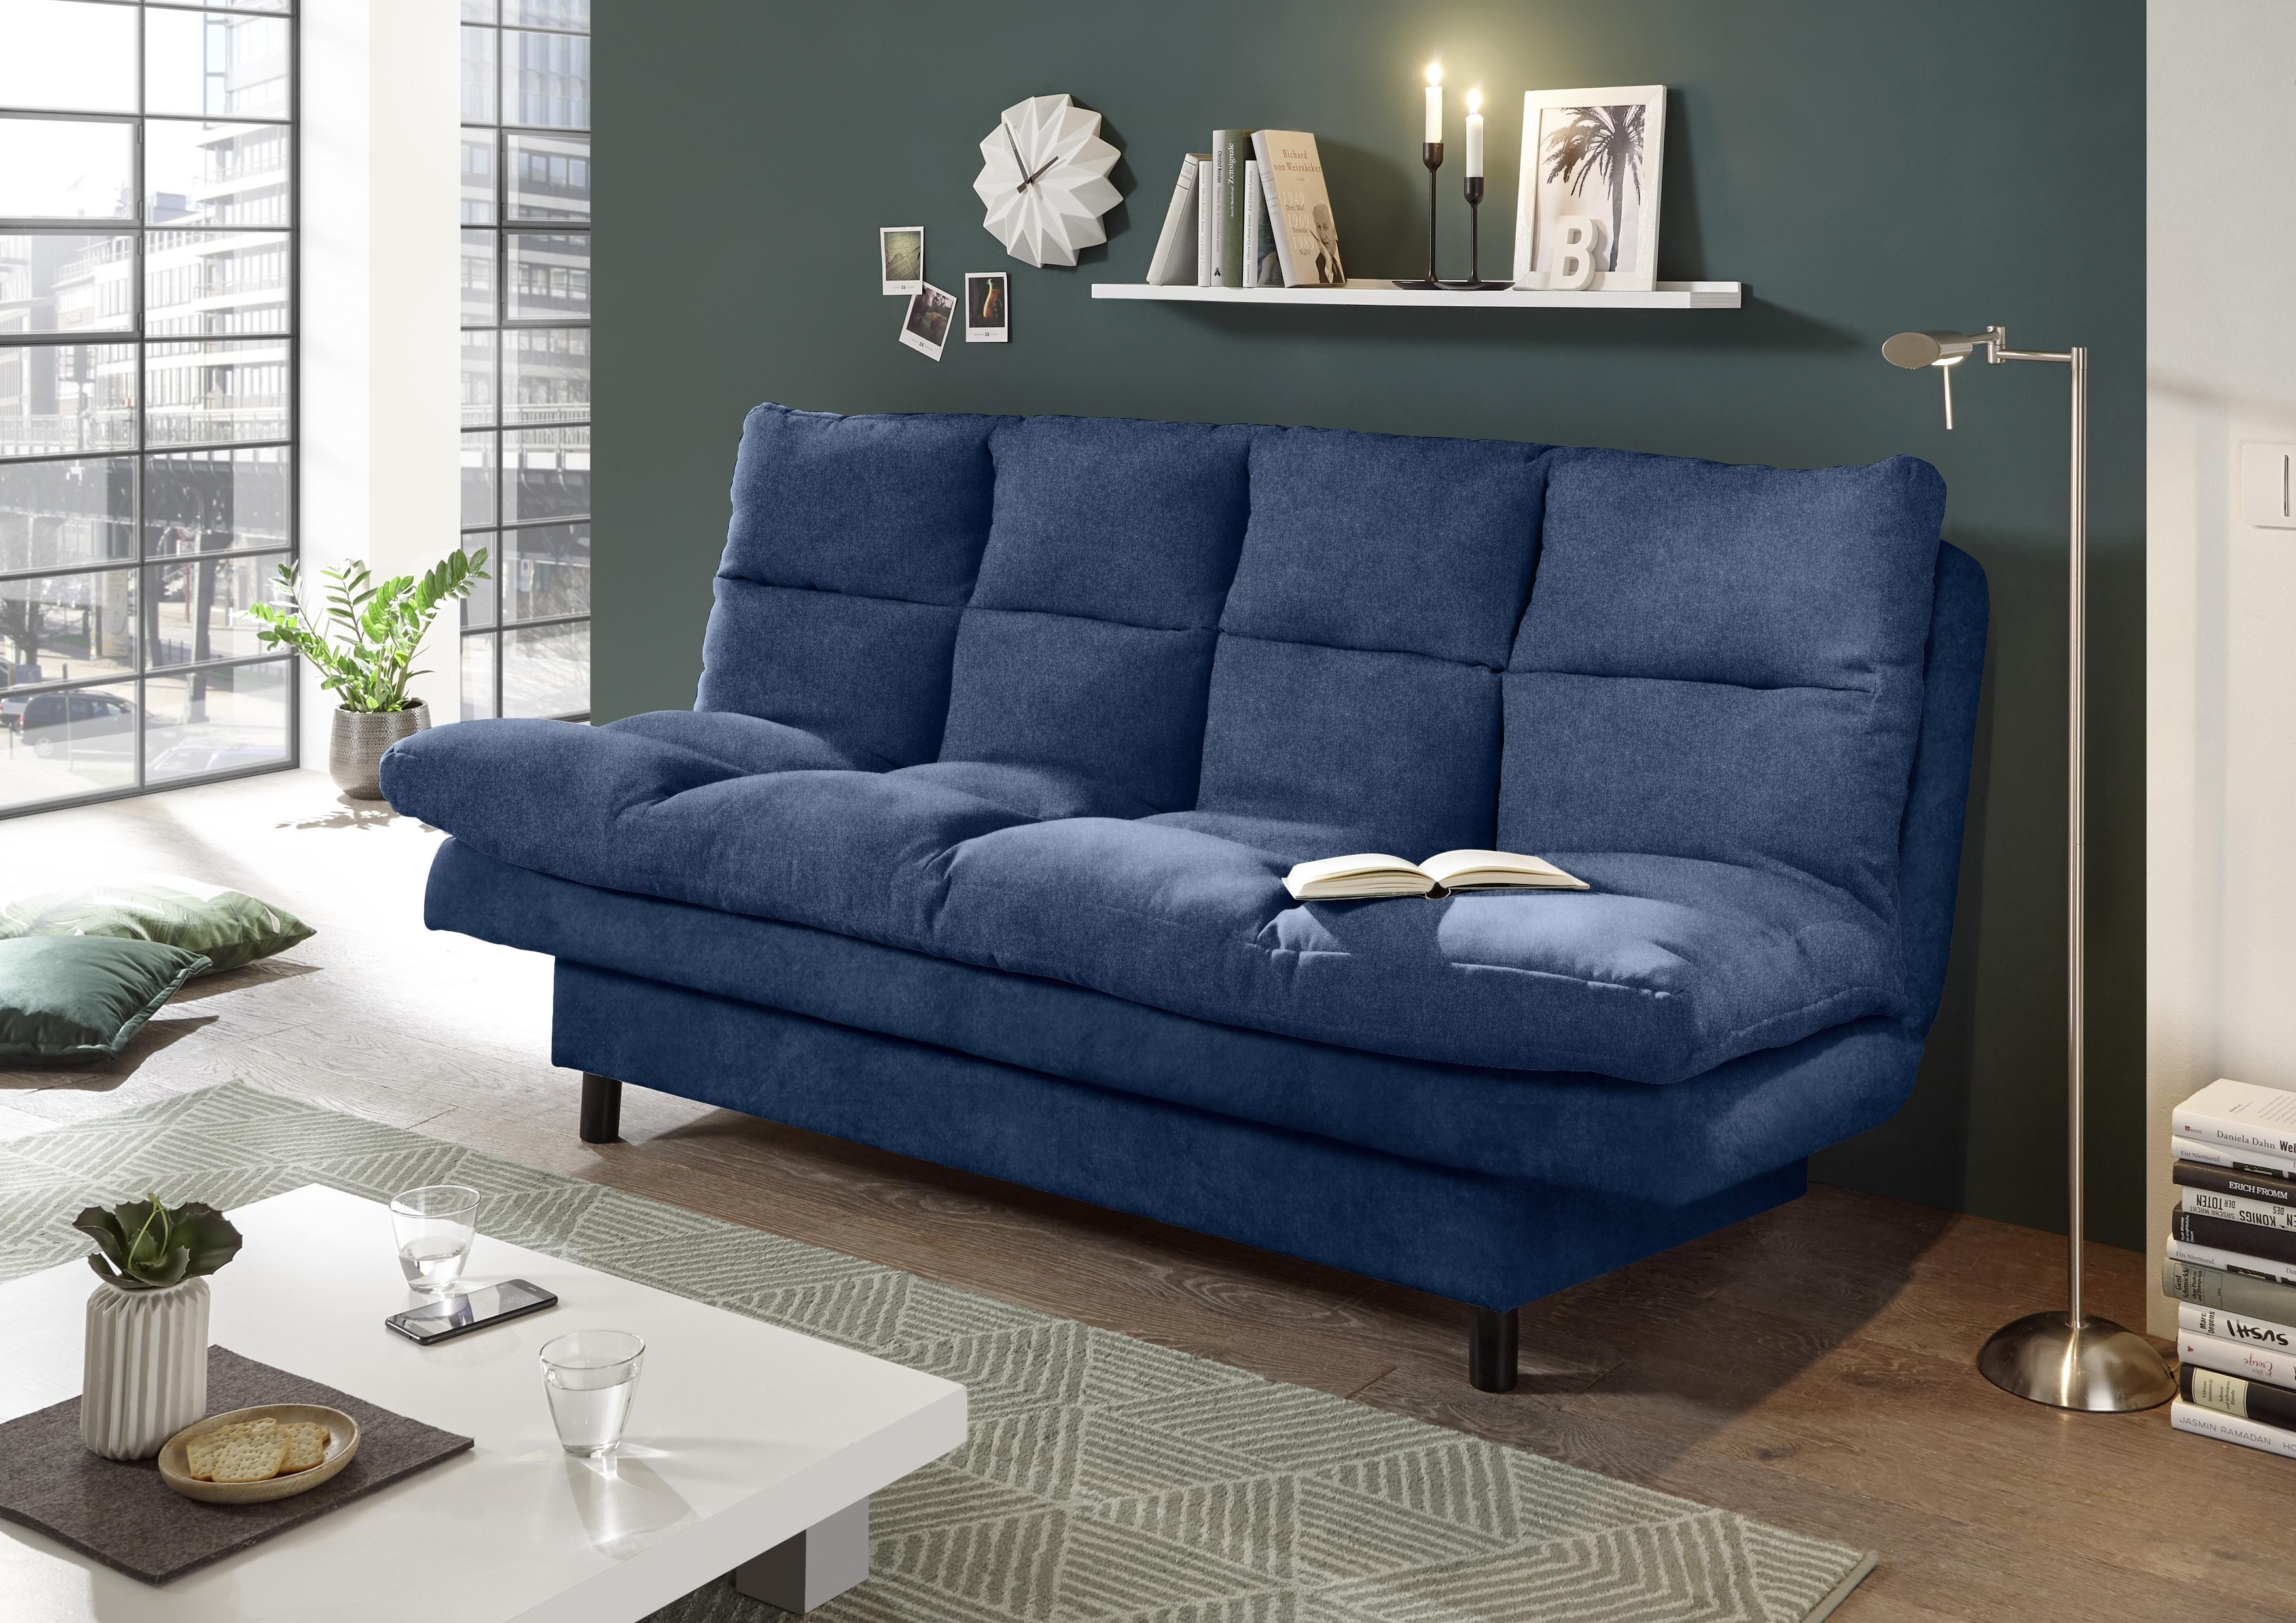 Canapea extensibila tapitata cu stofa, 3 locuri Lotta 2 Bleumarin, l190xA95xH85 cm